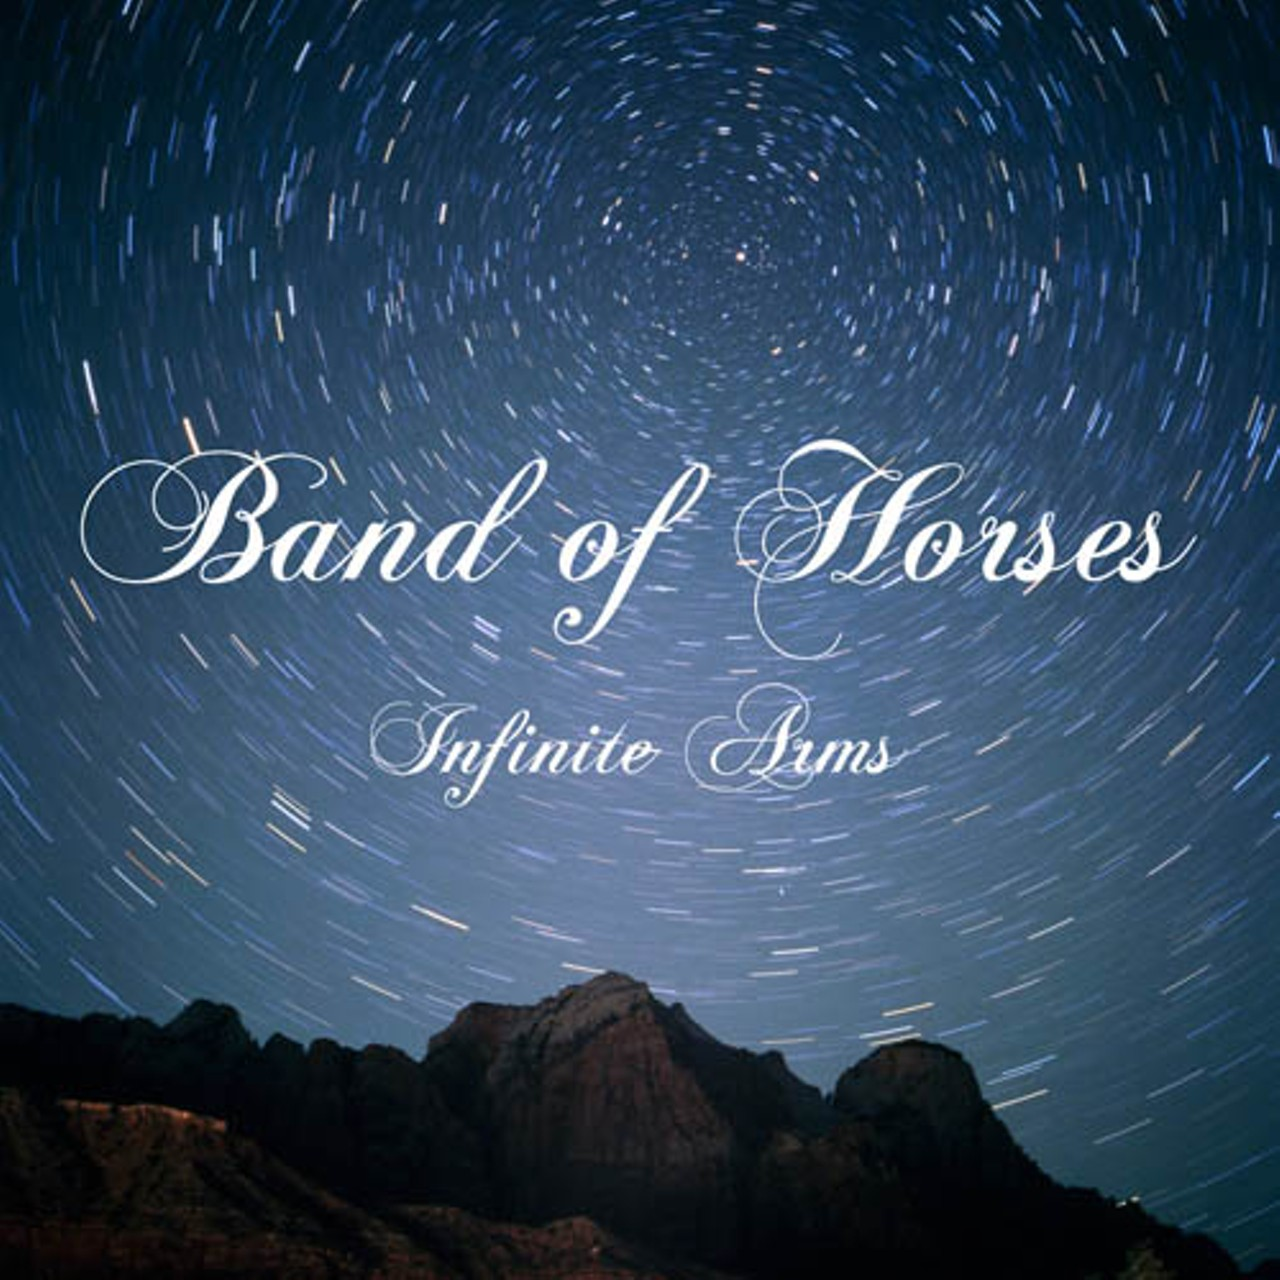 CD Review: Band of Horses\' Infinite Arms | Hit & Run Reviews ...